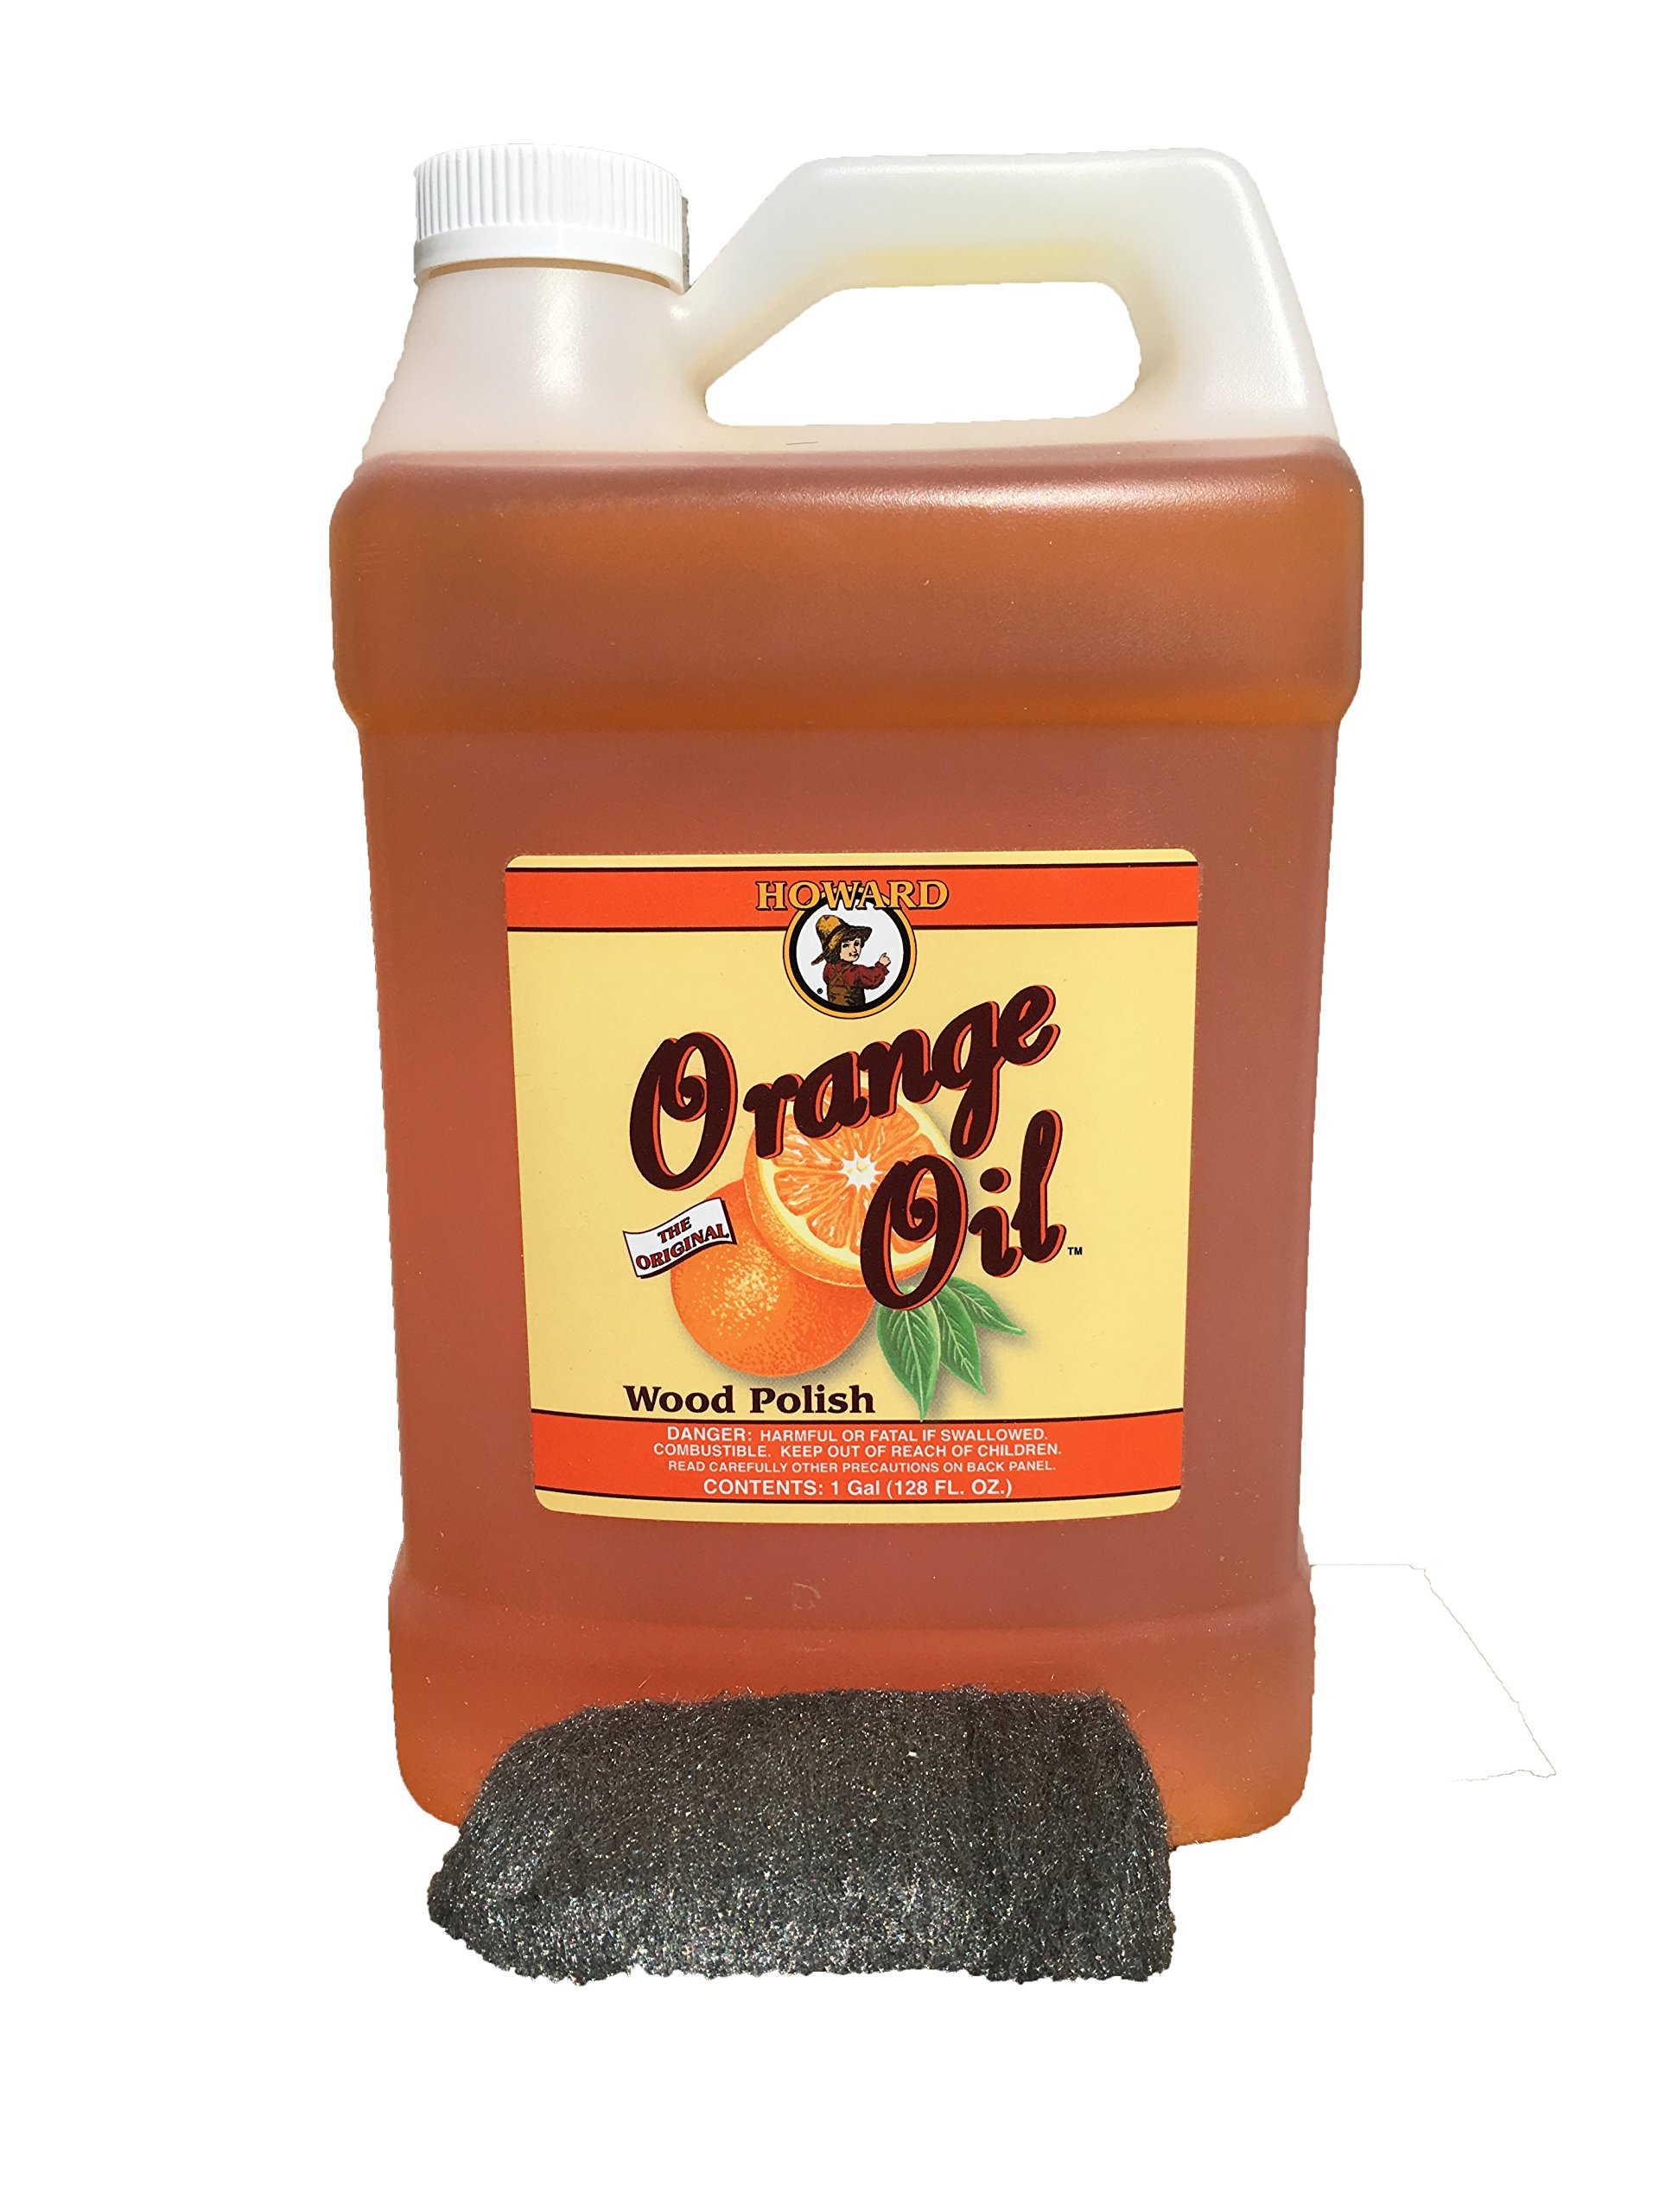 Howard Orange Oil 128 oz Gallon, Clean Kitchen Cabinets, Polish and Shine Wood Furniture, Orange Wood Cleaner